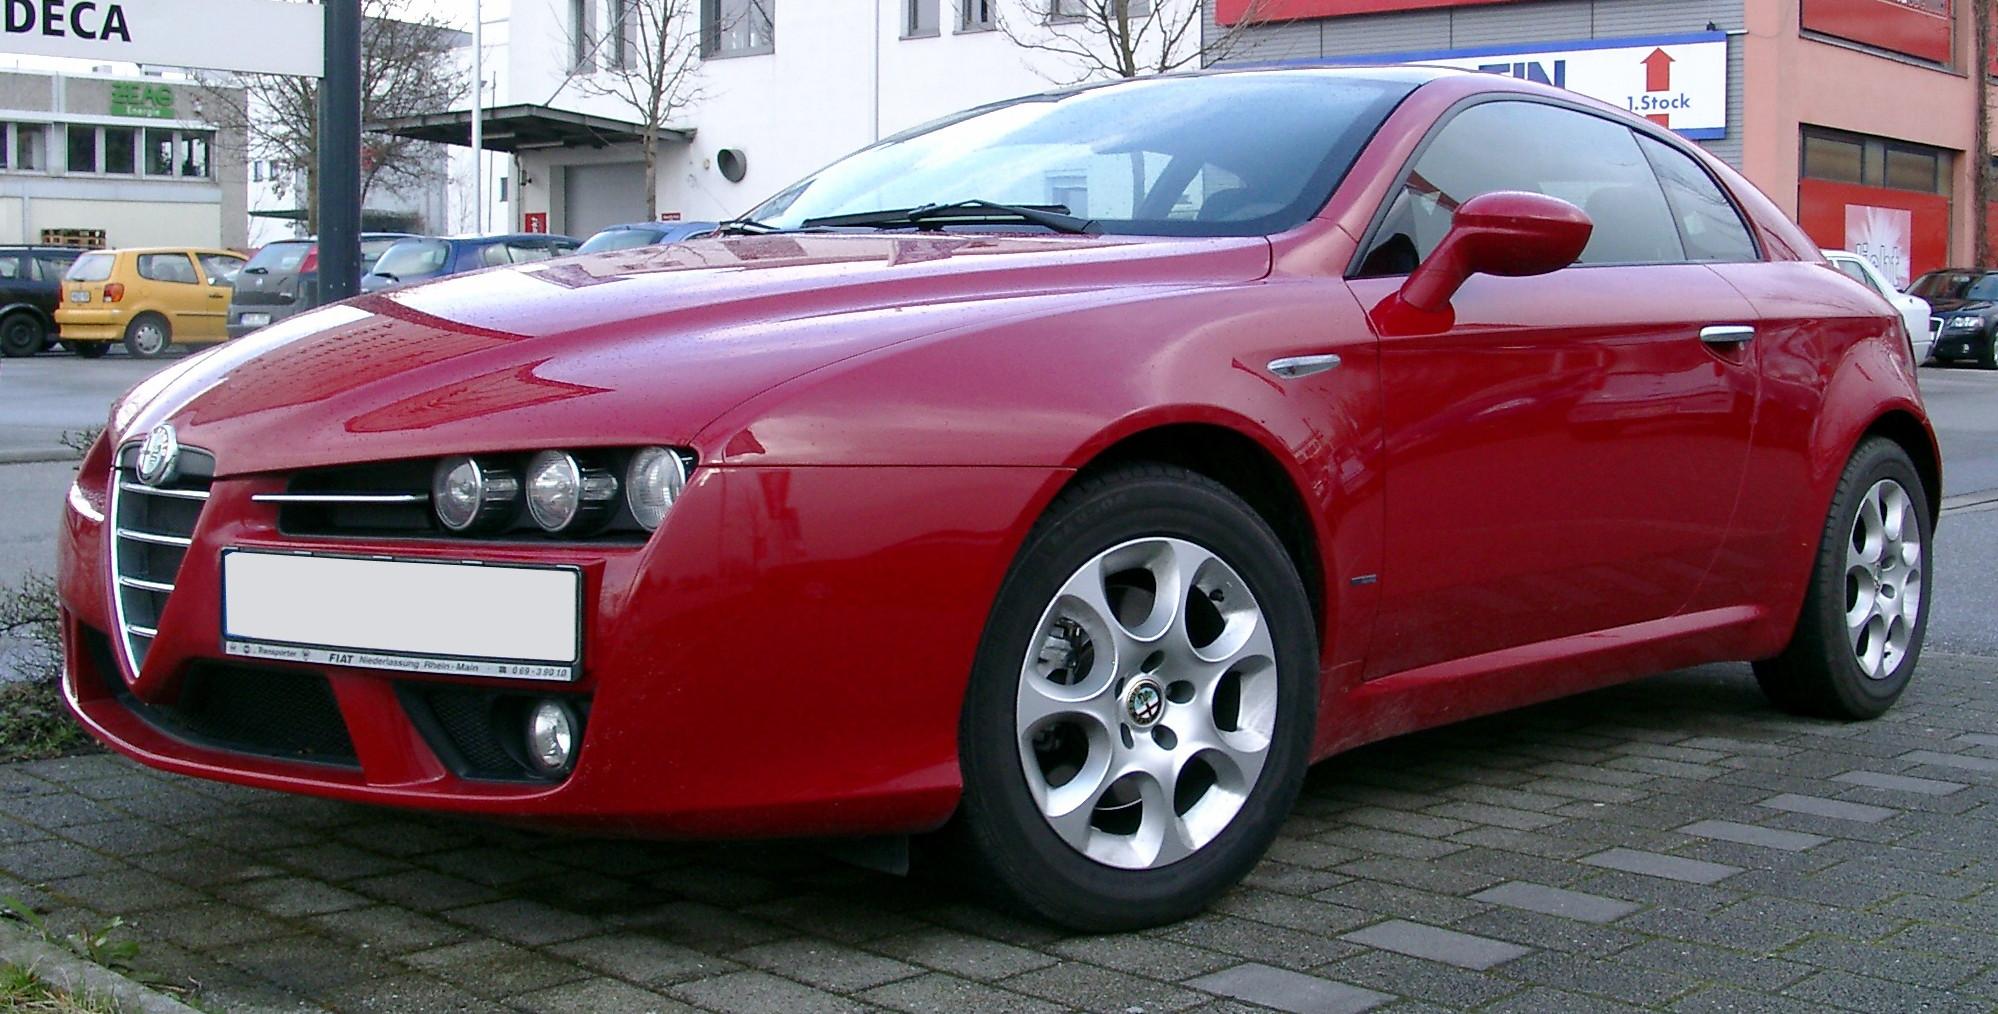 File:Alfa Romeo Brera Front 20070321.jpg - Wikimedia Commons